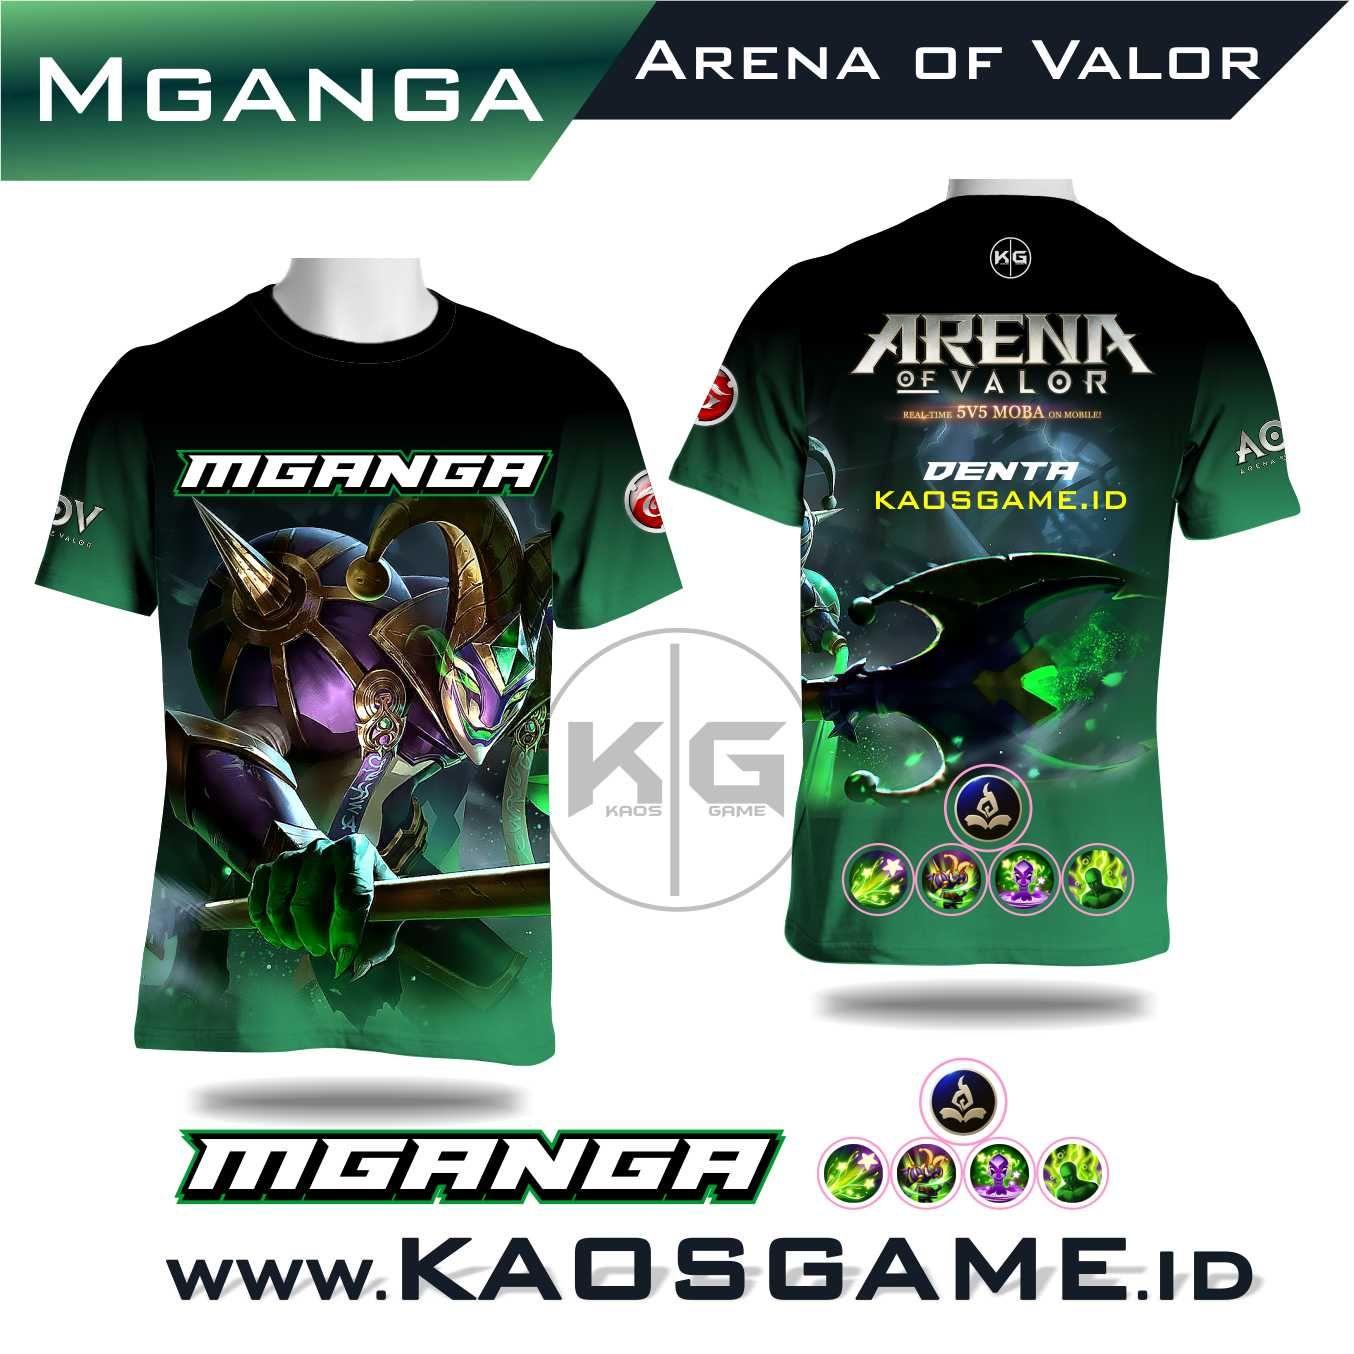 Kaos Kaos Mganga Skin Original Arena Of Valor Aov Sablon Full Print